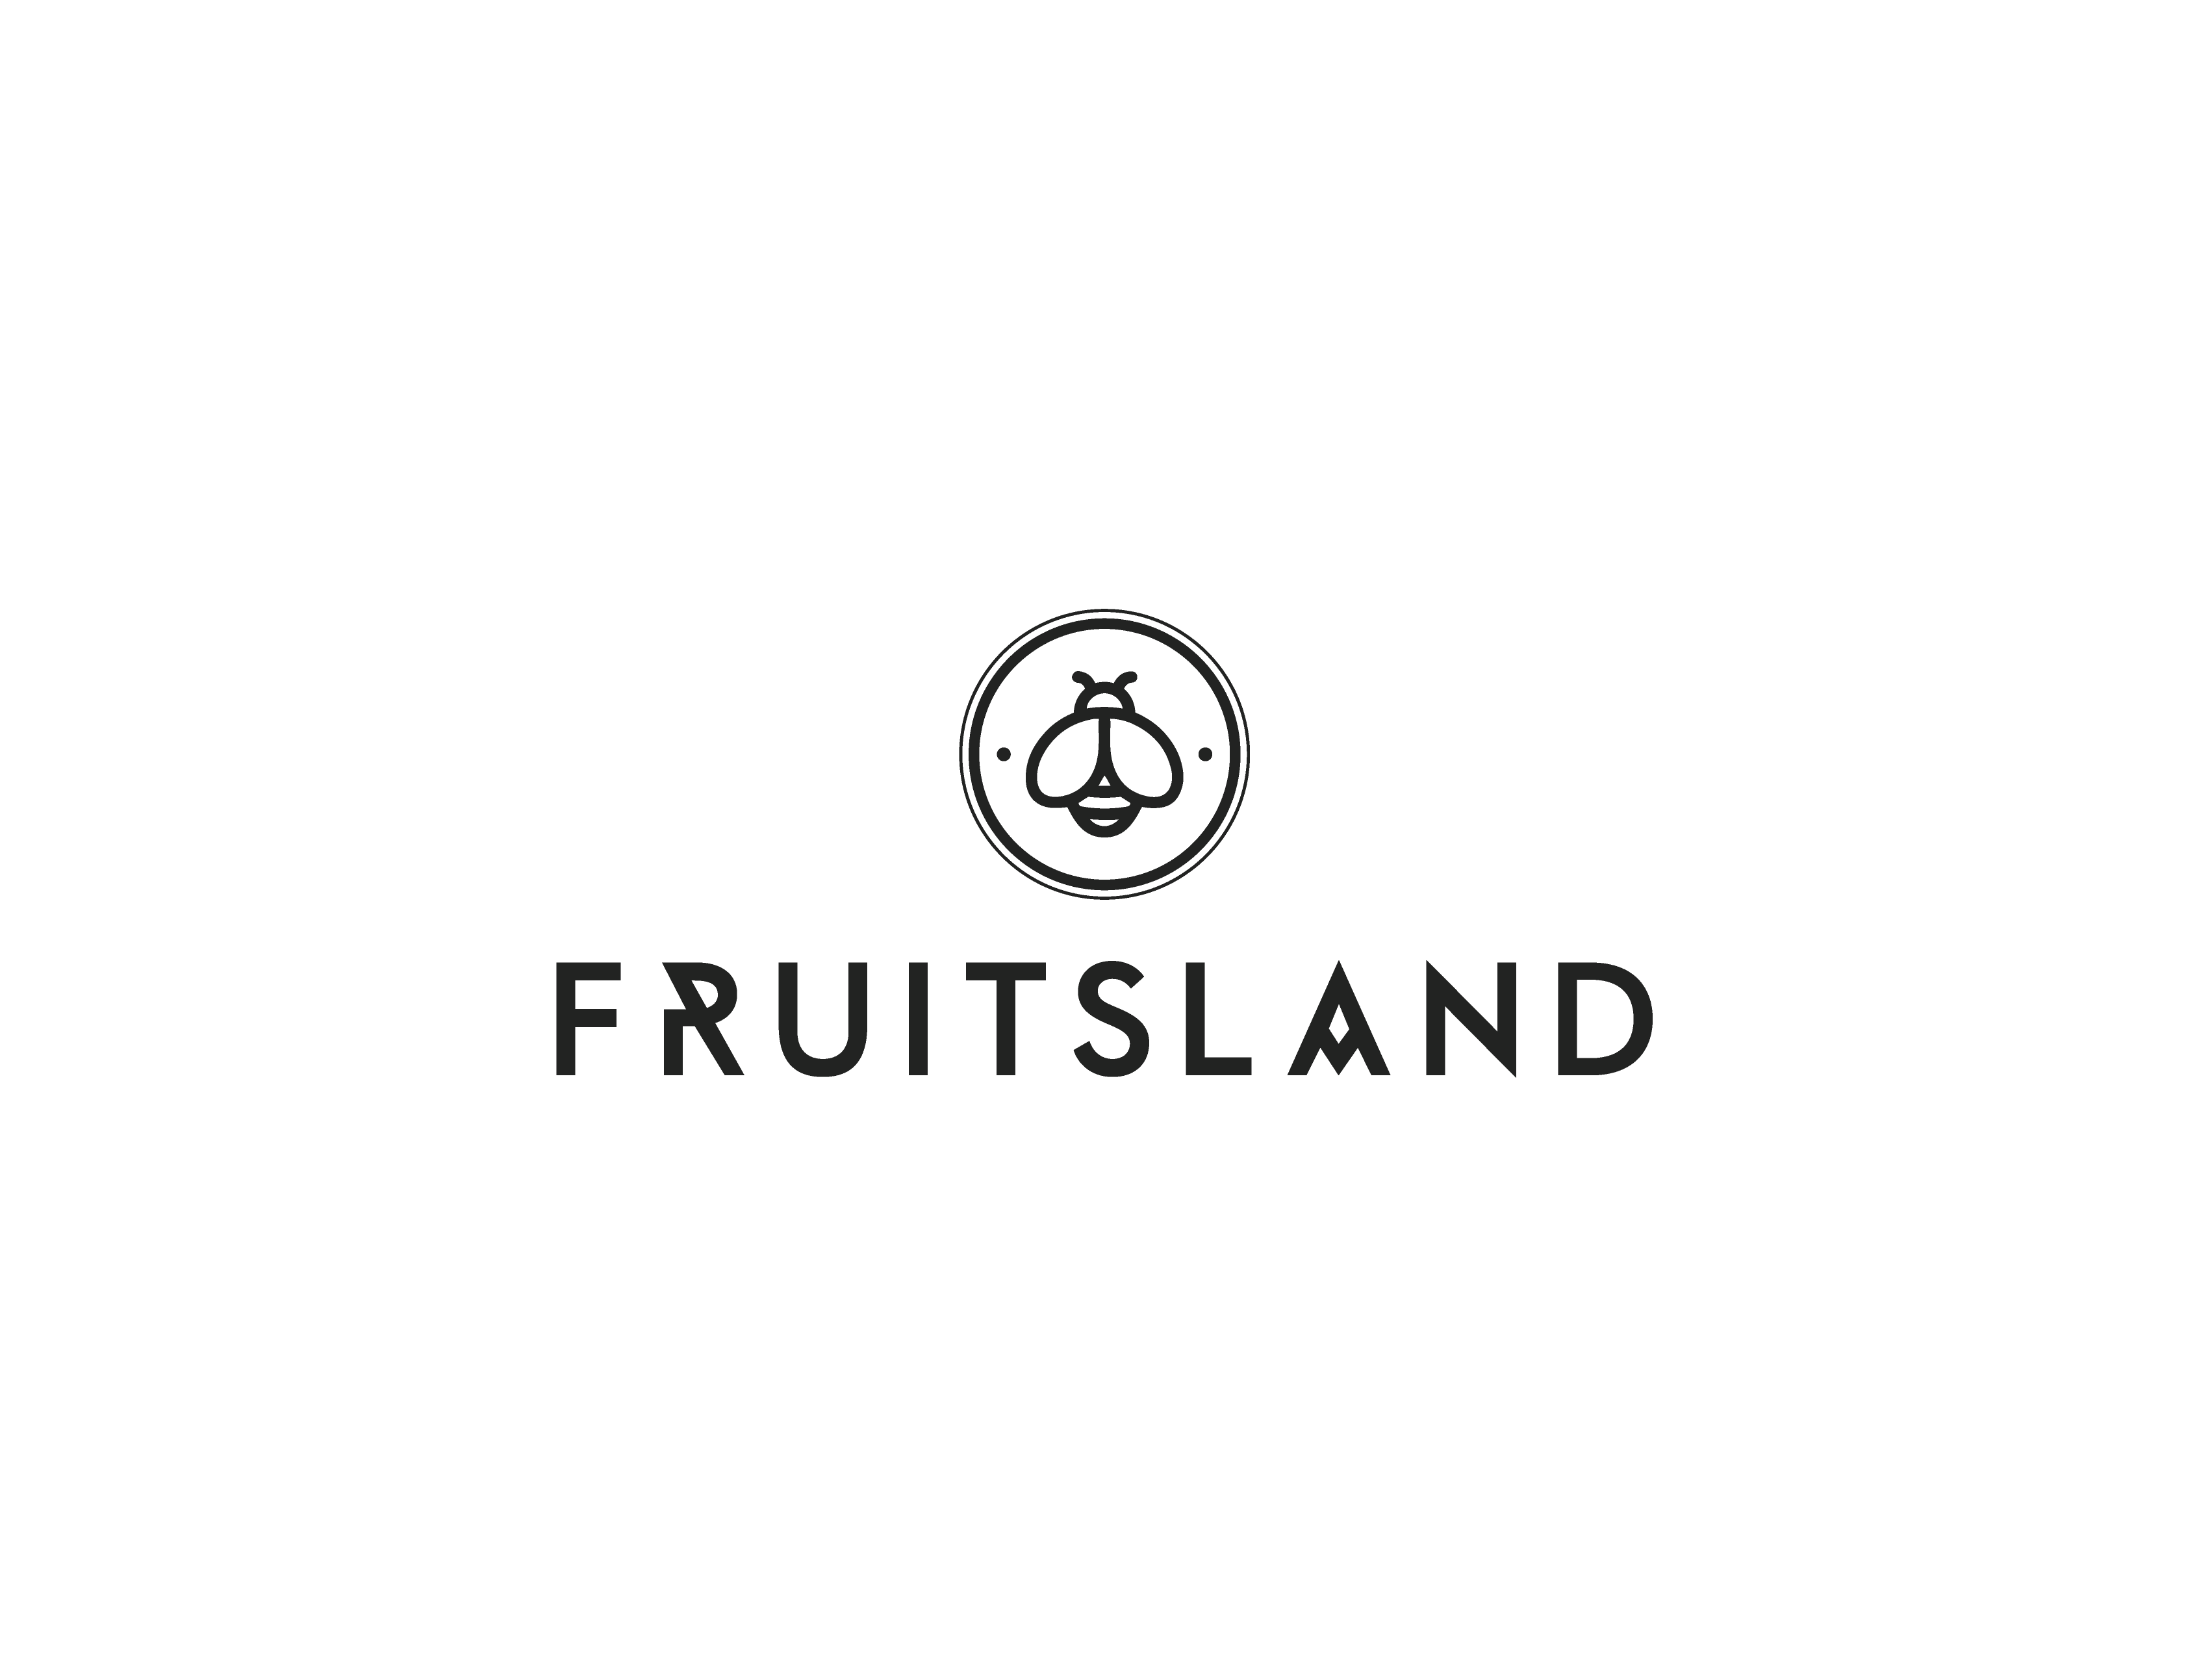 logo fruitsland